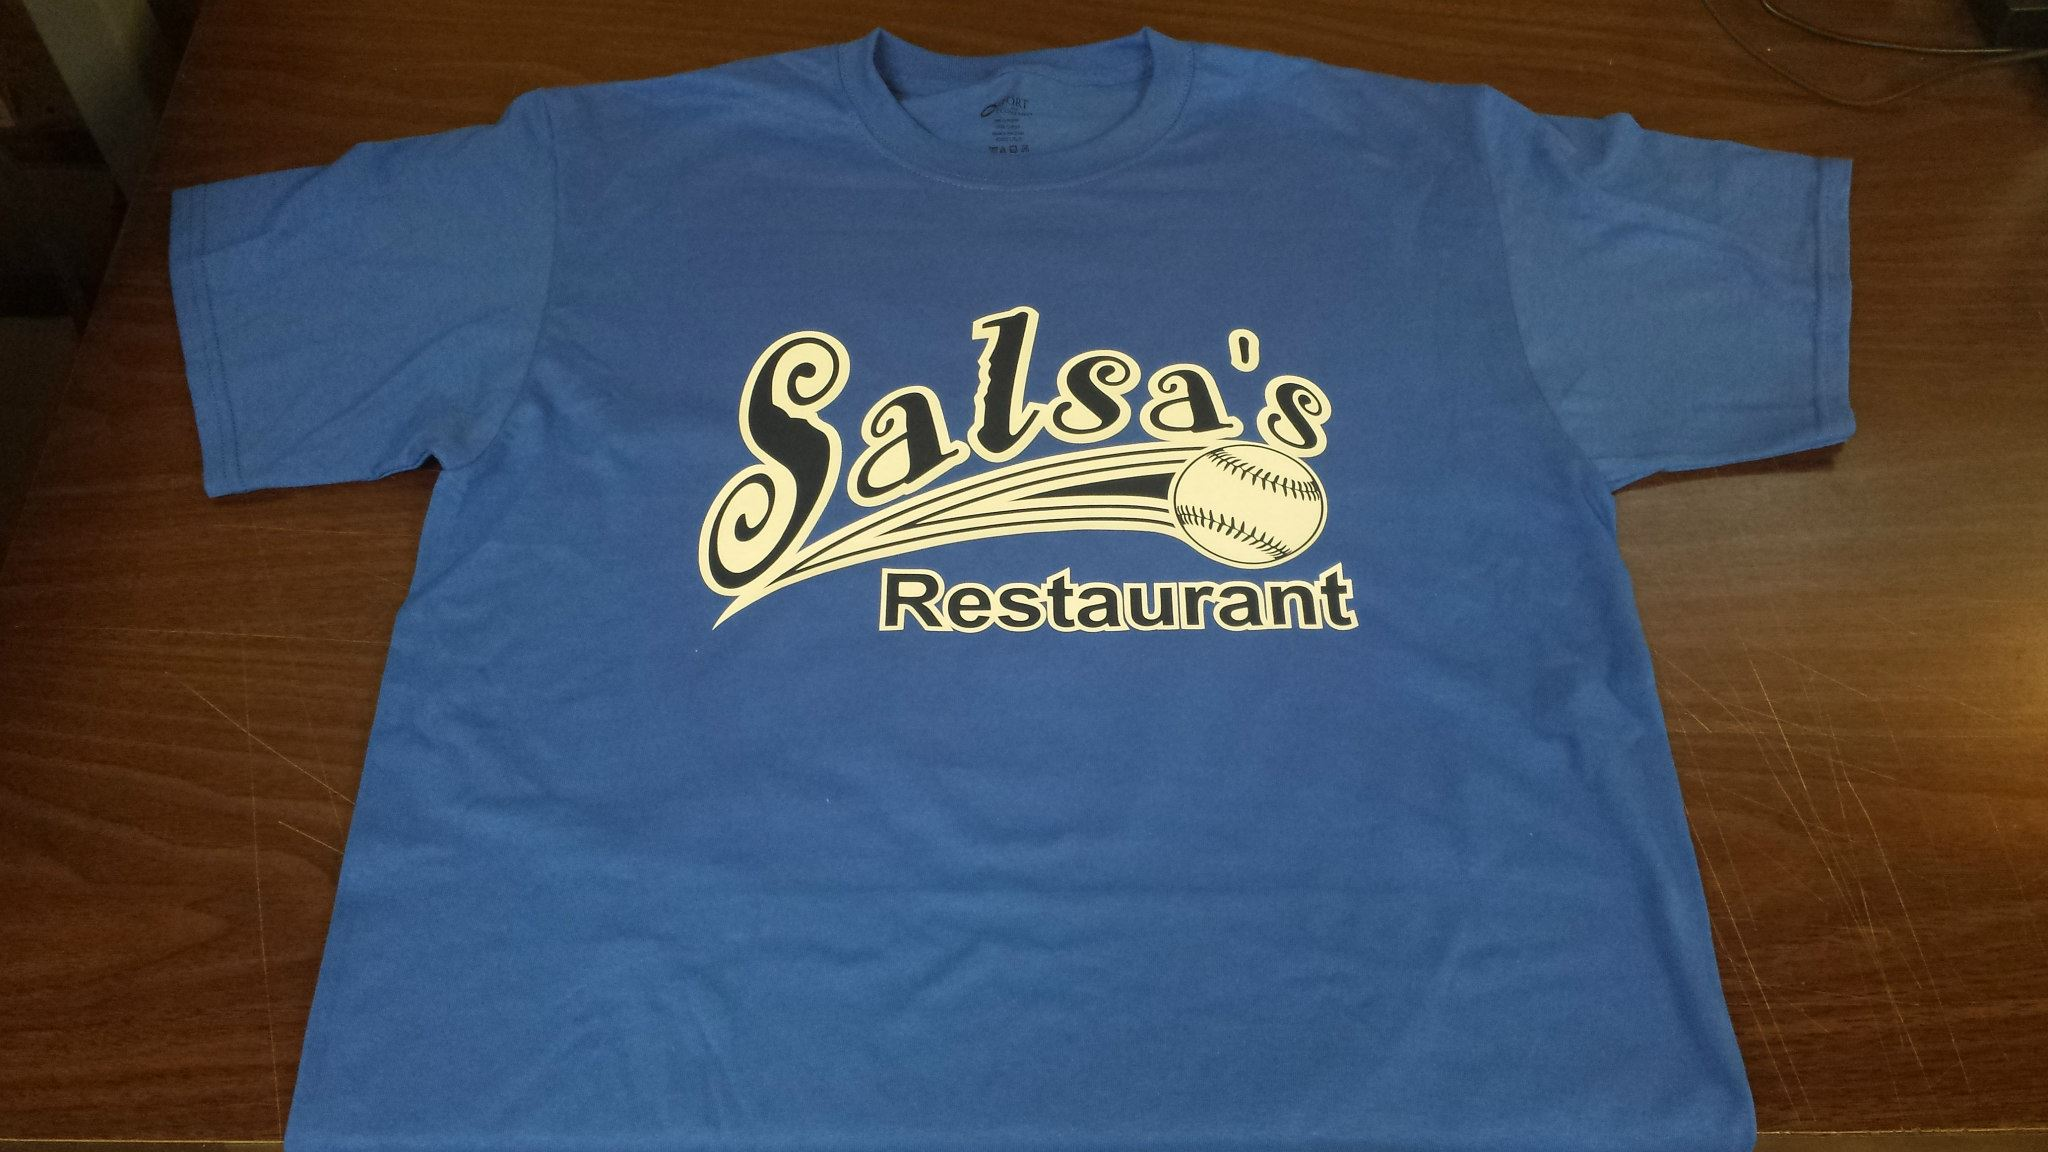 Salsa's Restaurant